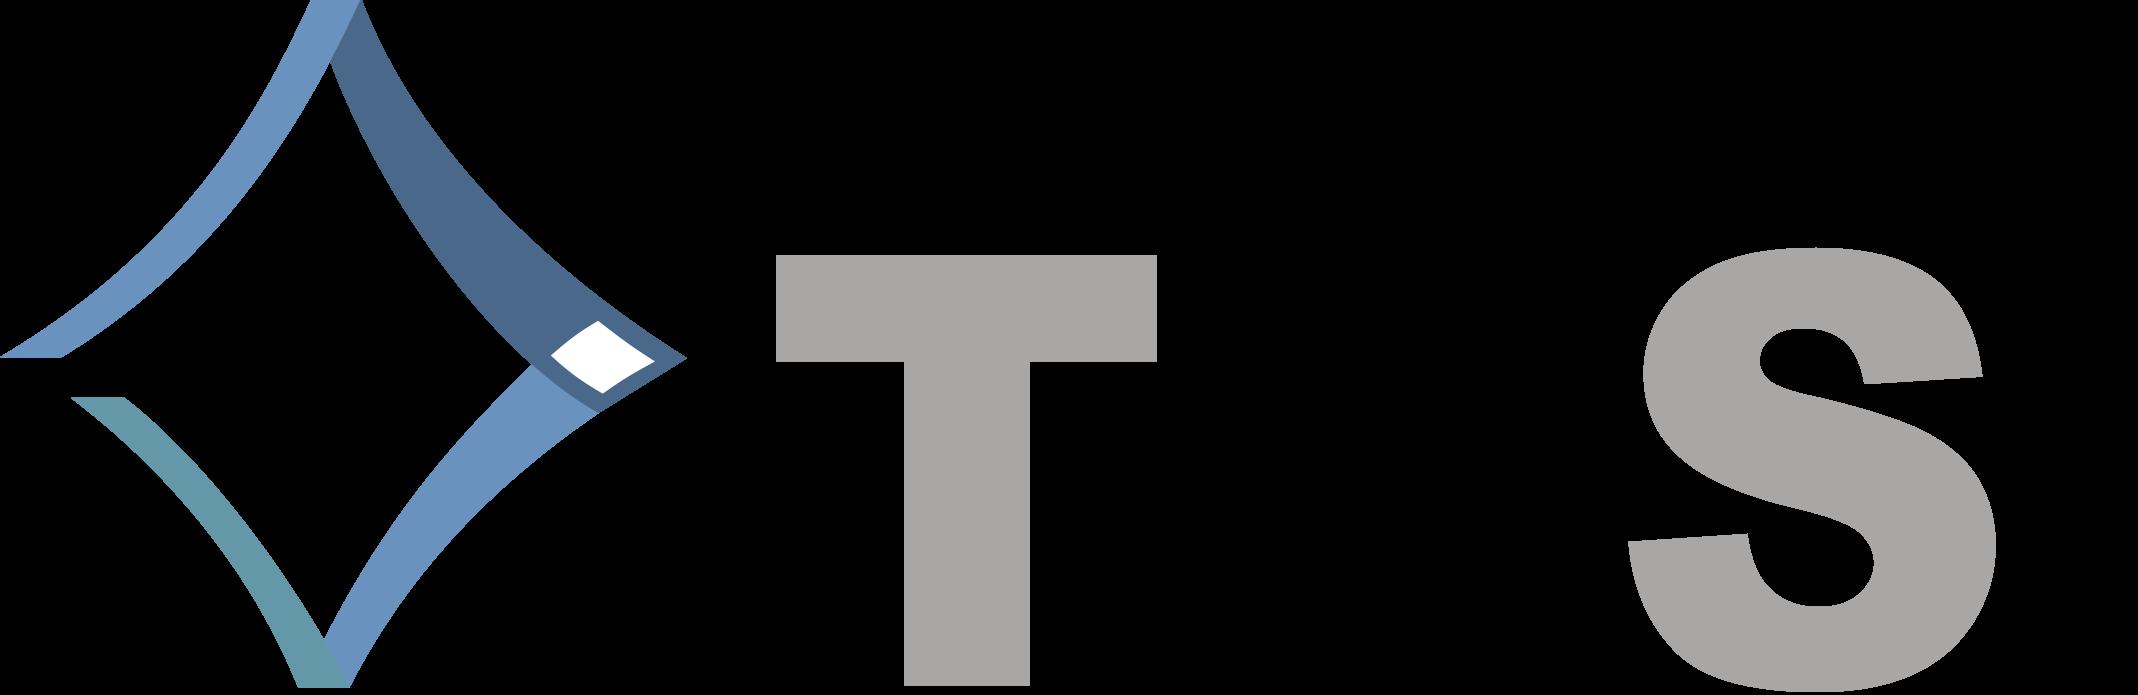 TESI Tecnologia & Sicurezza S.r.l.